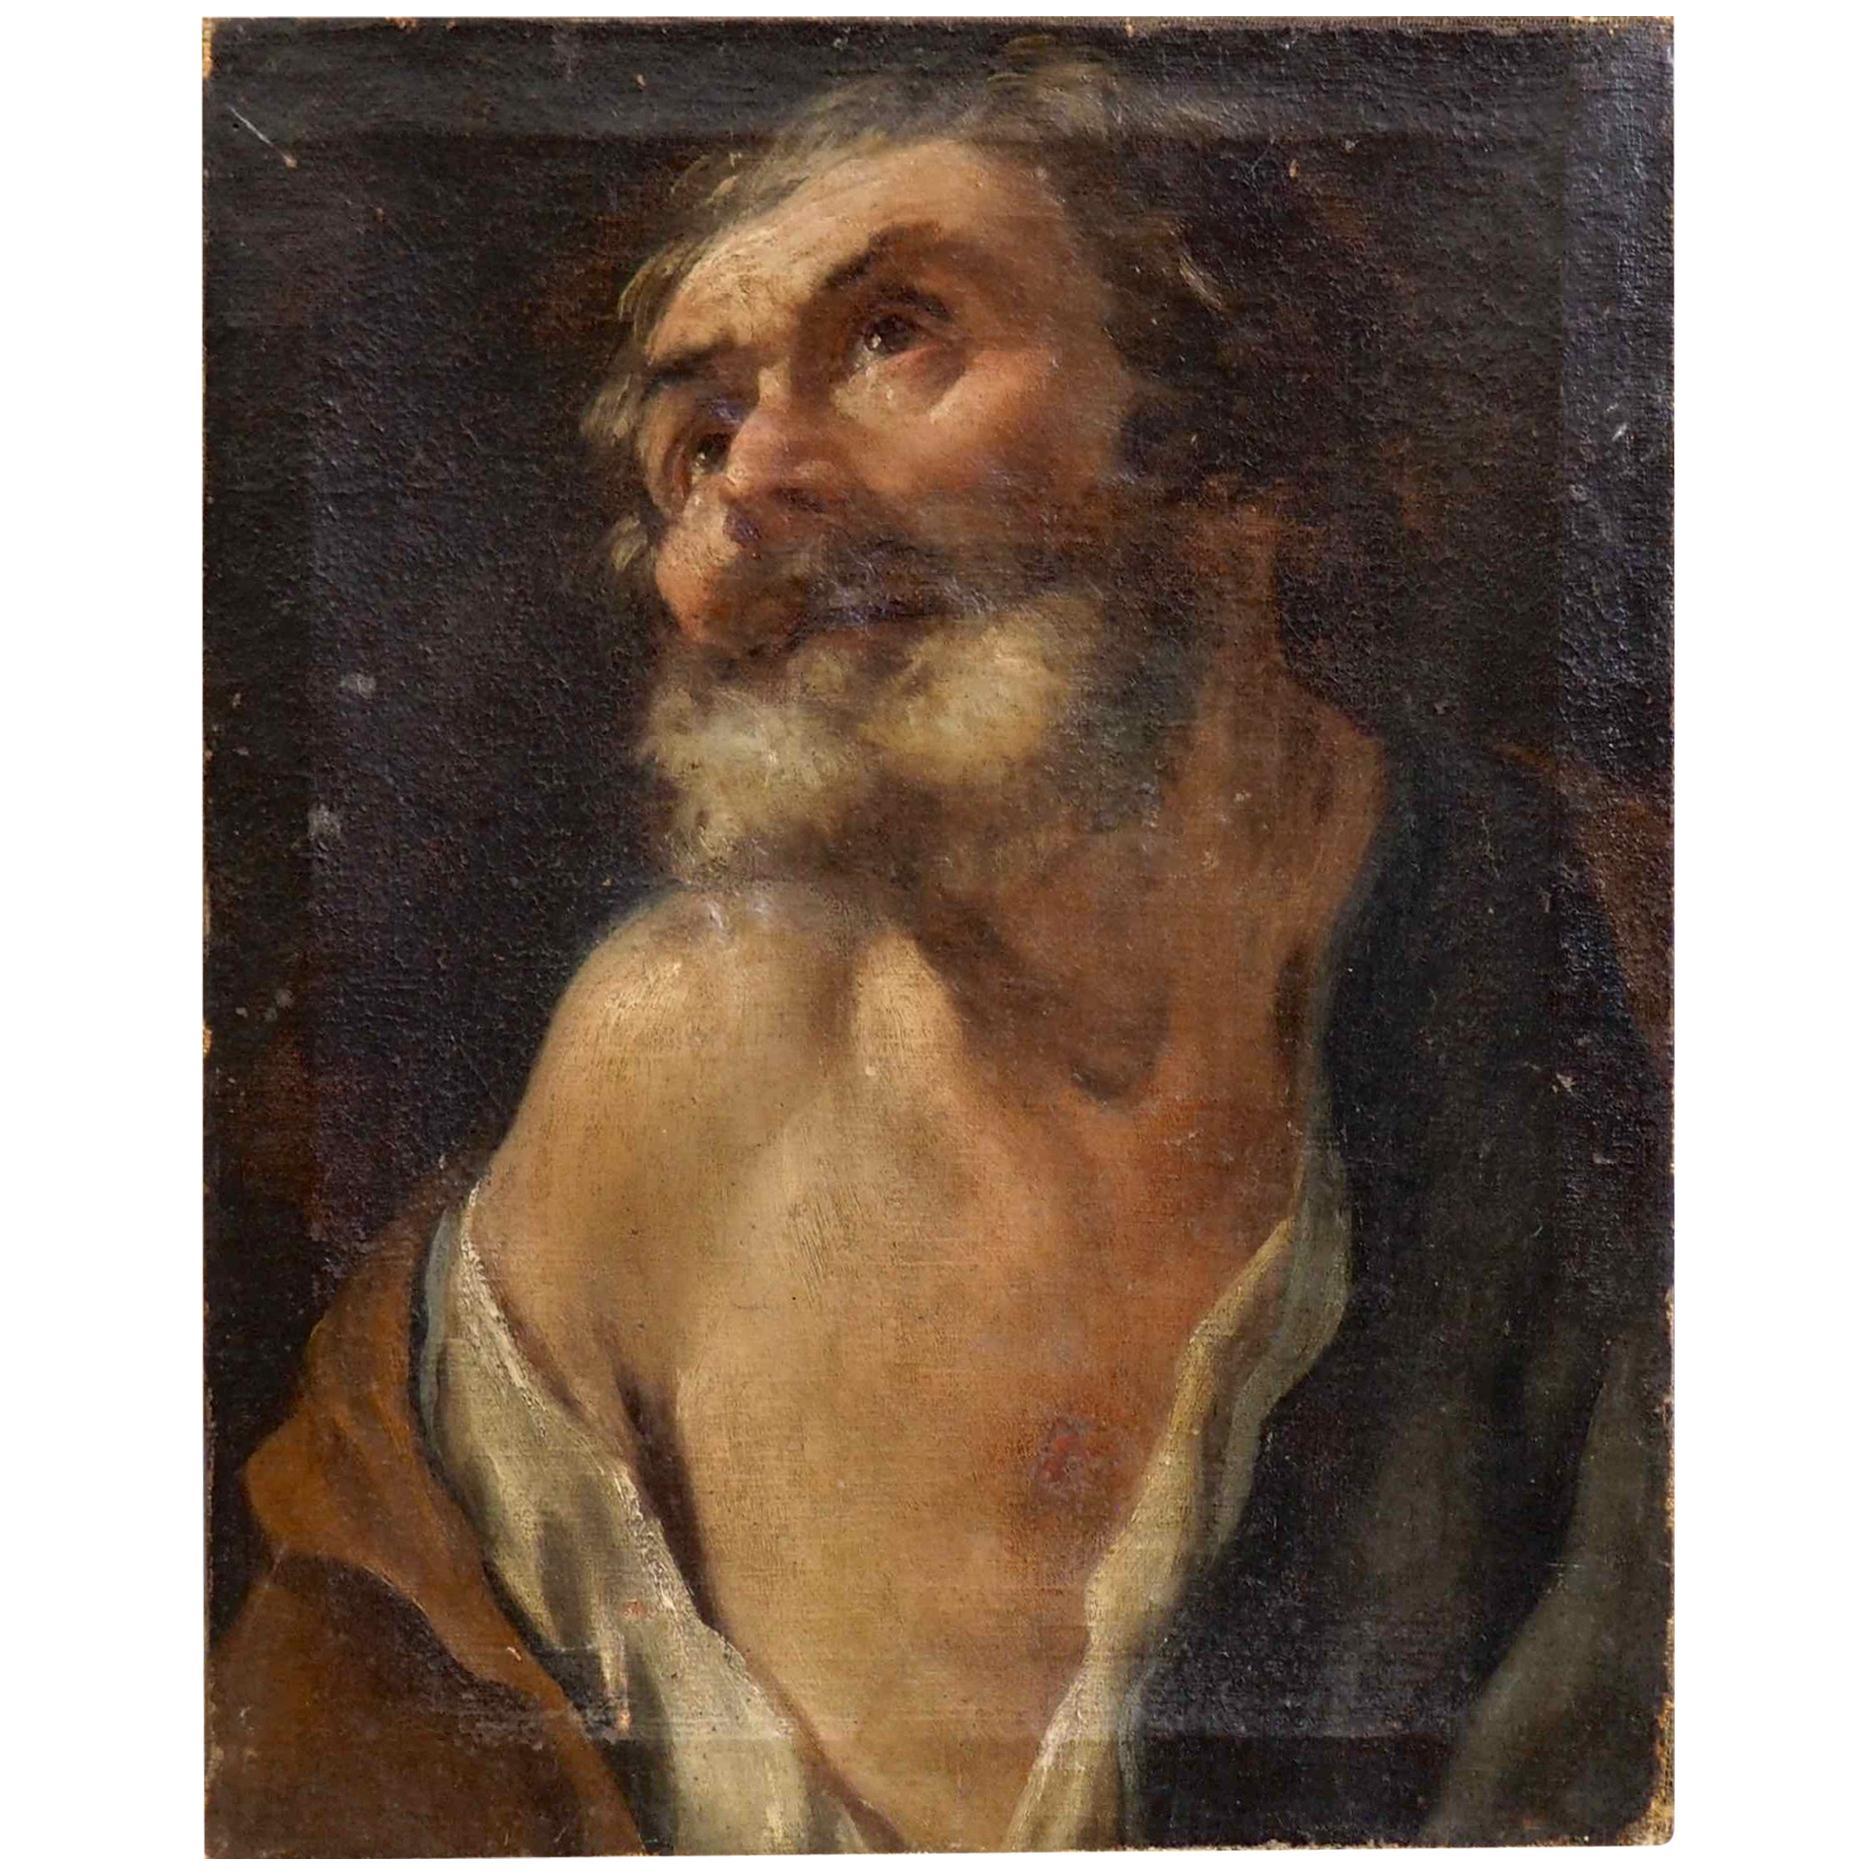 Italian Old Master Painting, 17th Century, Oil on Canvas